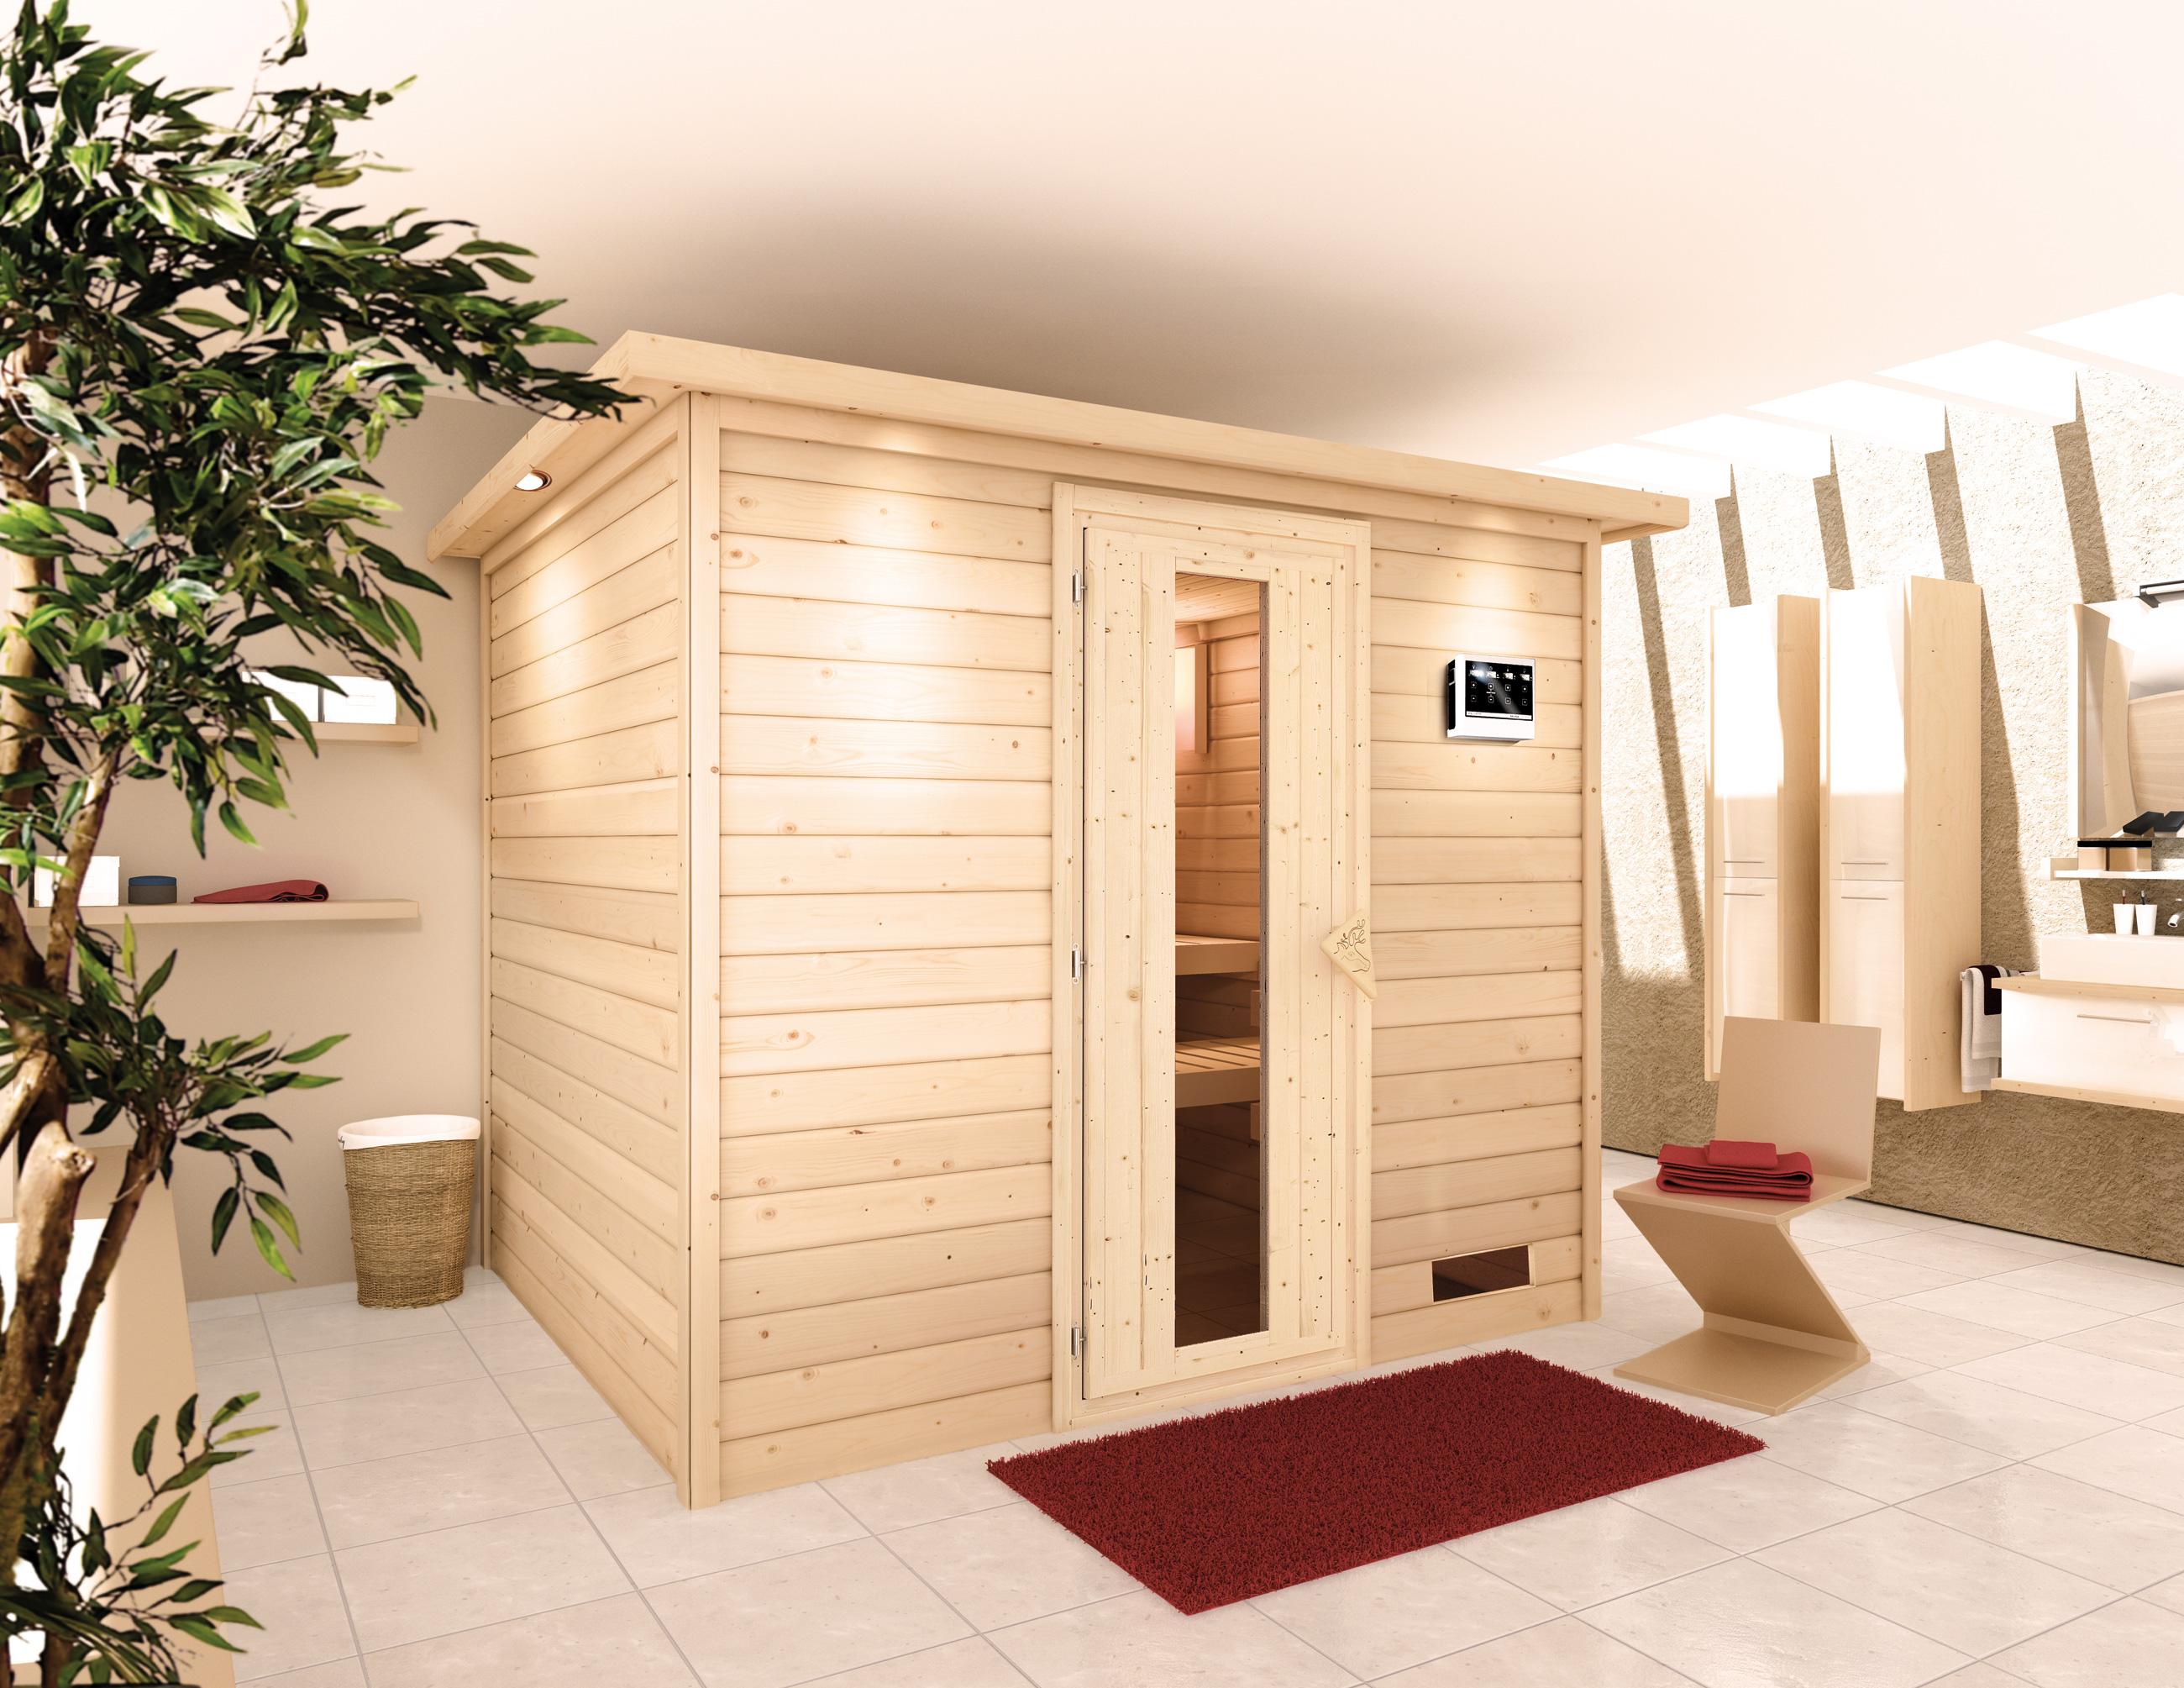 Woodfeeling Sauna Karla 38mm Kranz Ofen Bio 9kW Tür Holz Bild 13